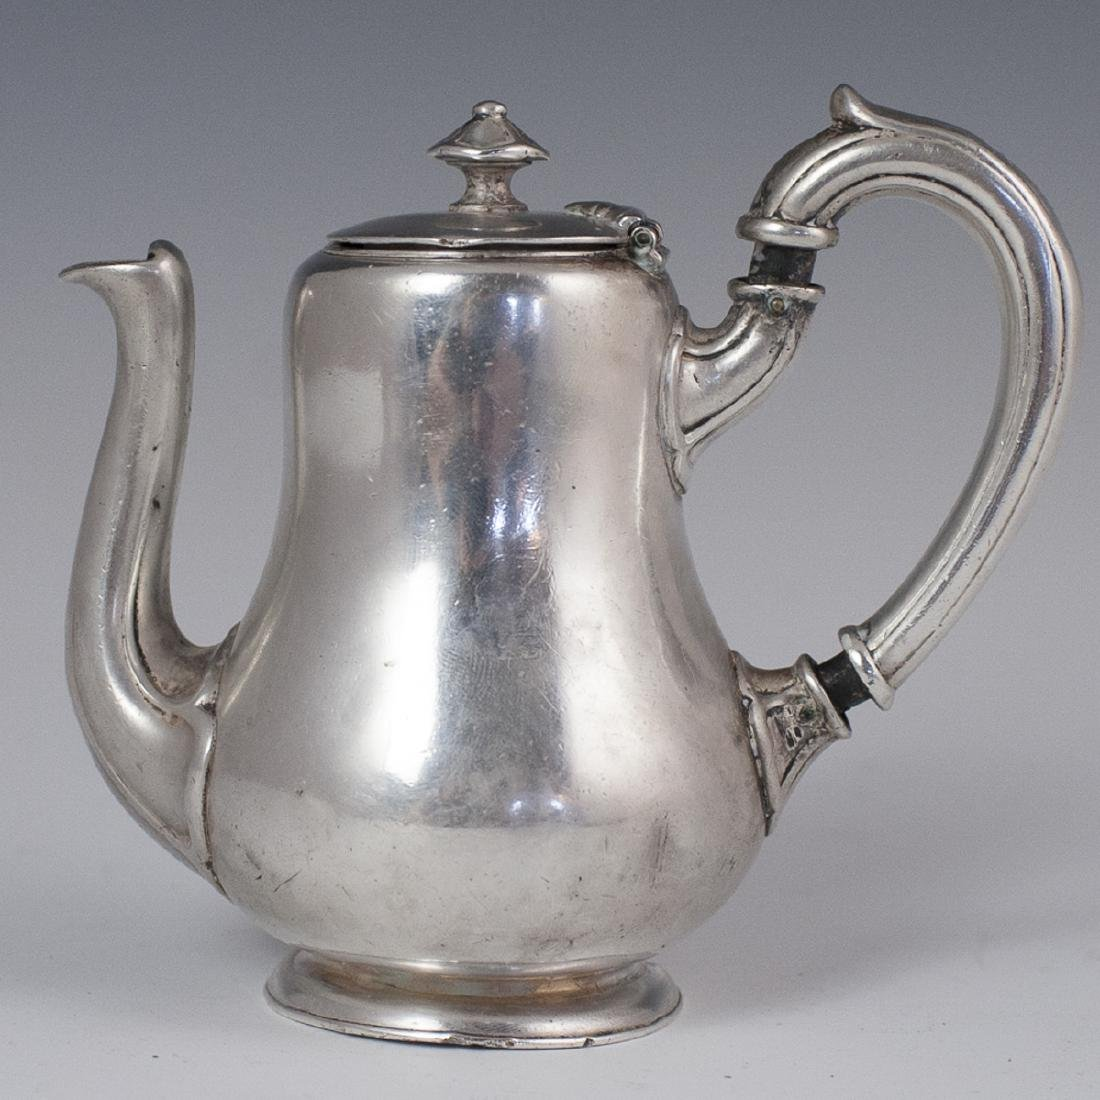 Antique Christofle Metal Blanc Teapot